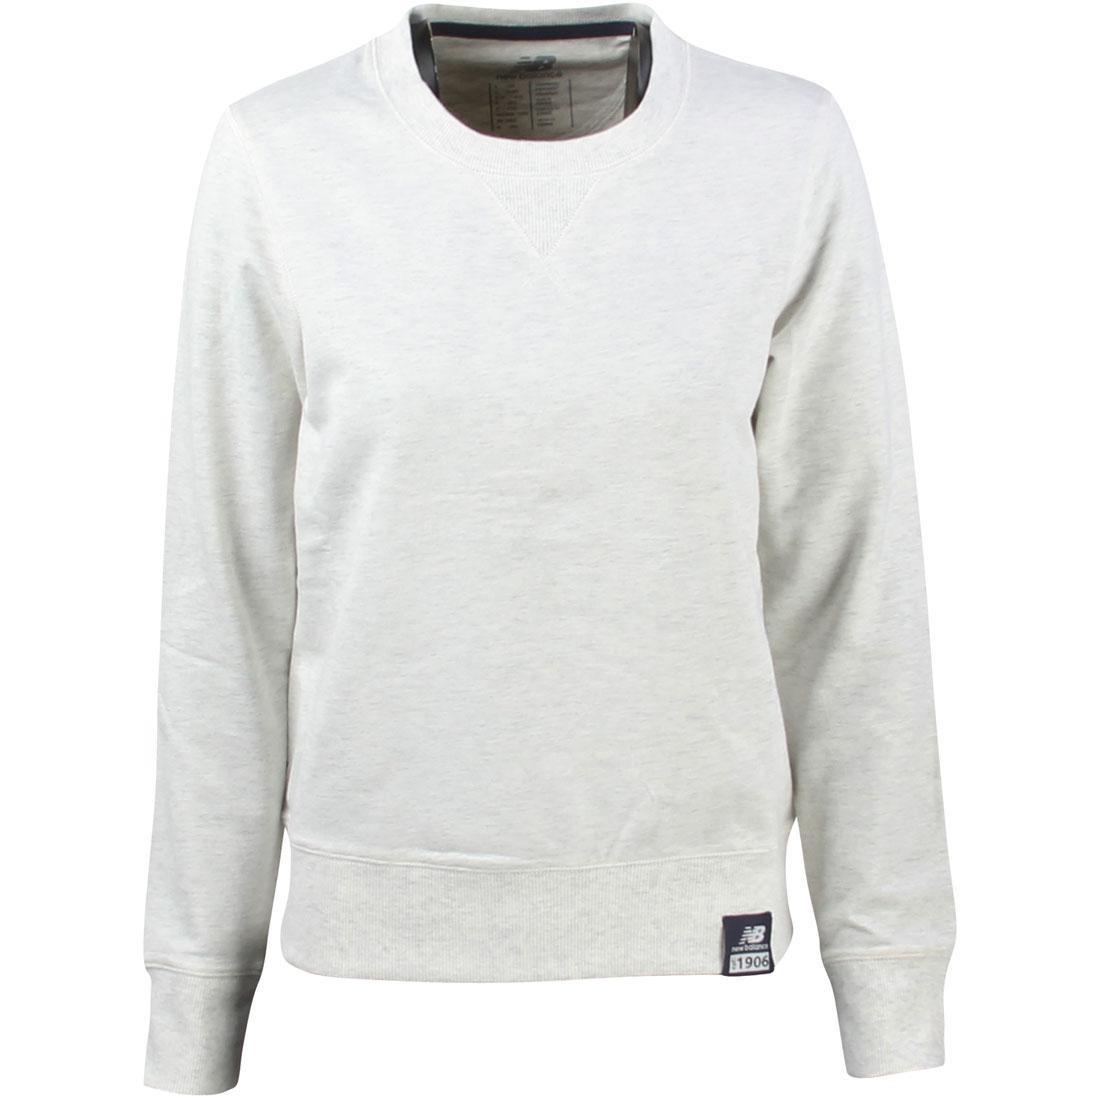 New Balance Women Crewneck Sweater (gray / sea salt heather)